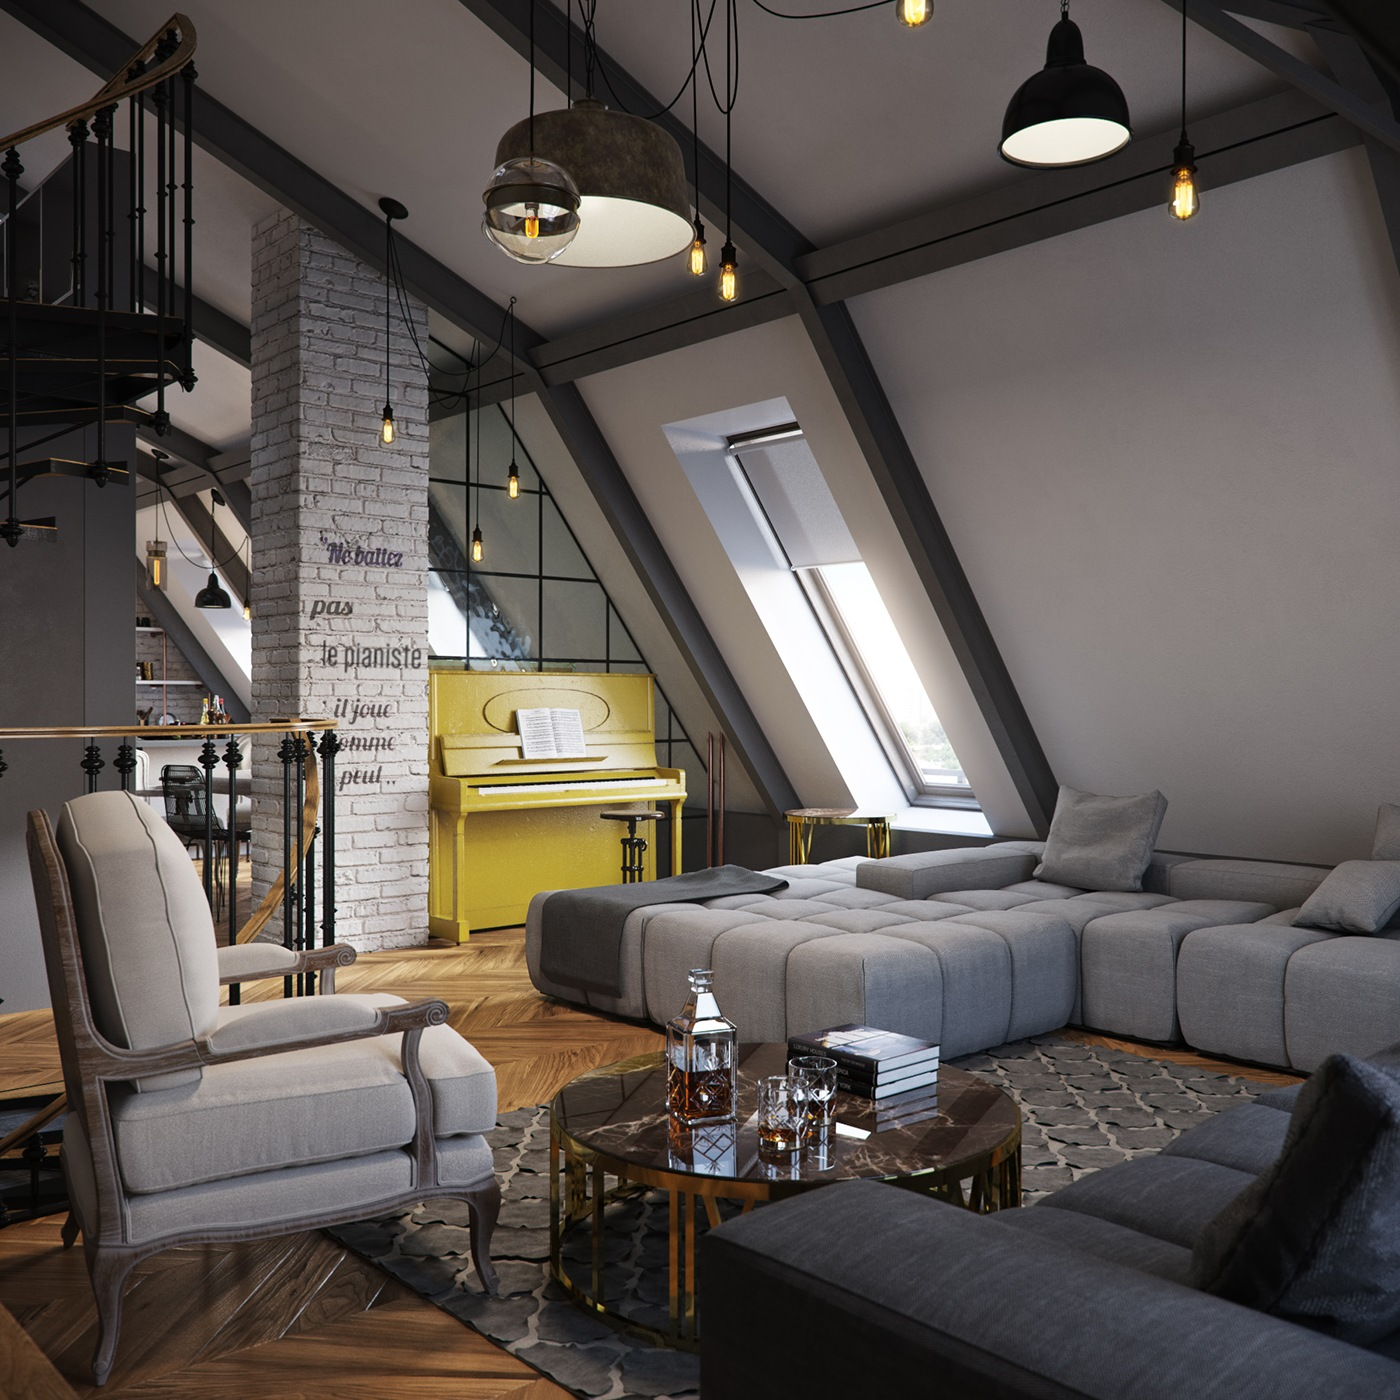 Dark Color For Small Apartment Interior Design With ...